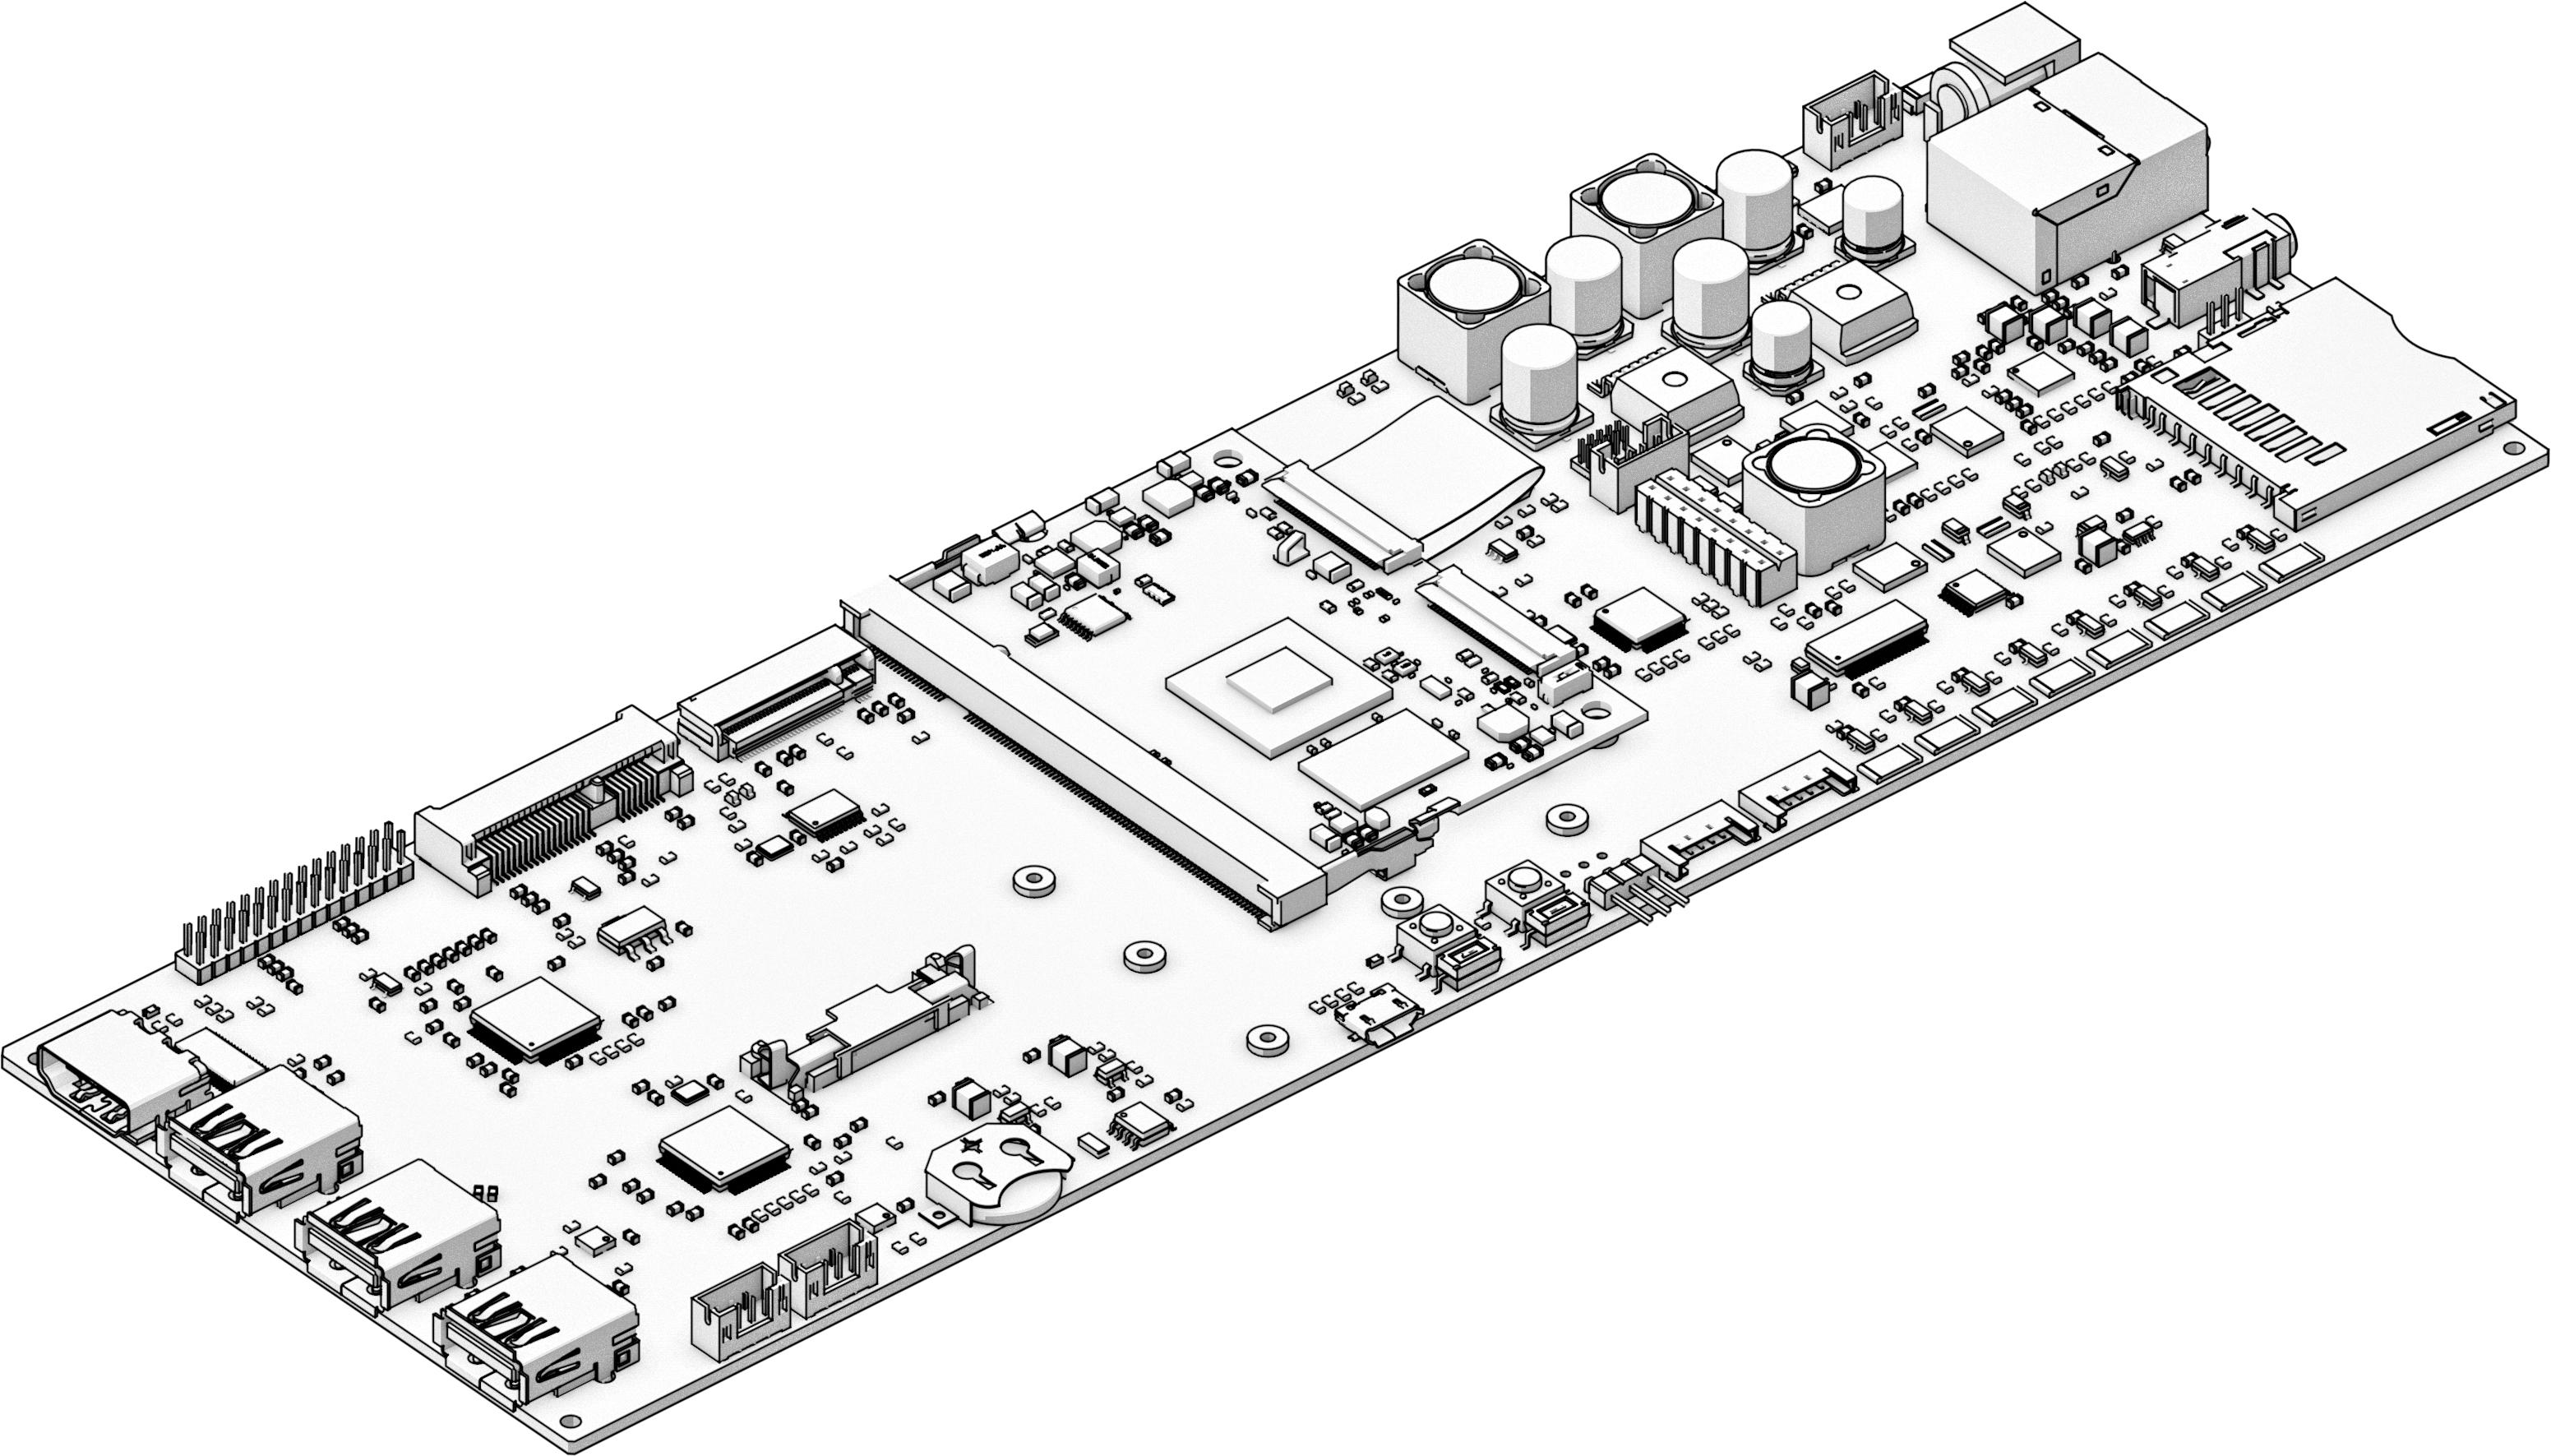 src/source/_static/illustrations/3.png